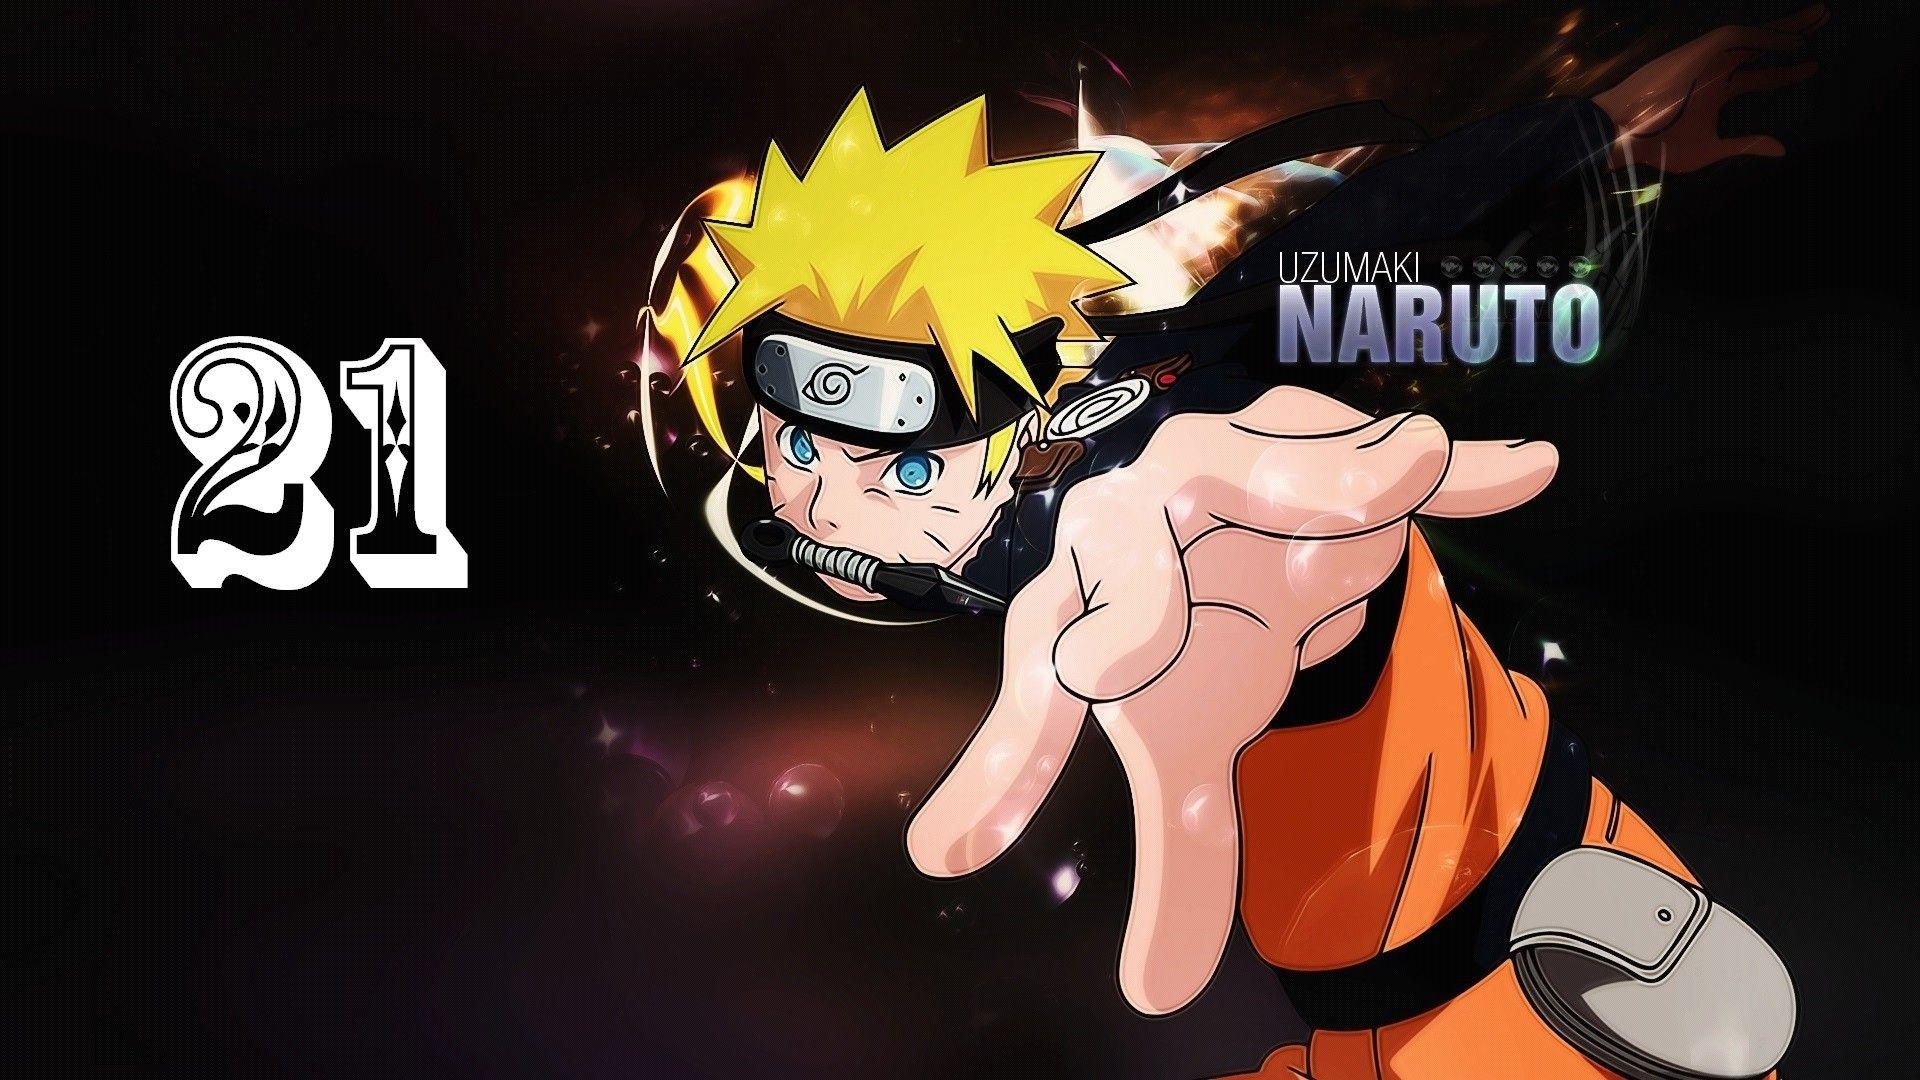 Naruto Uzumaki Hd Wallpapers New Tab Theme Naruto Wallpaper Anime Wallpaper Anime Anime wallpaper hd new tab themes